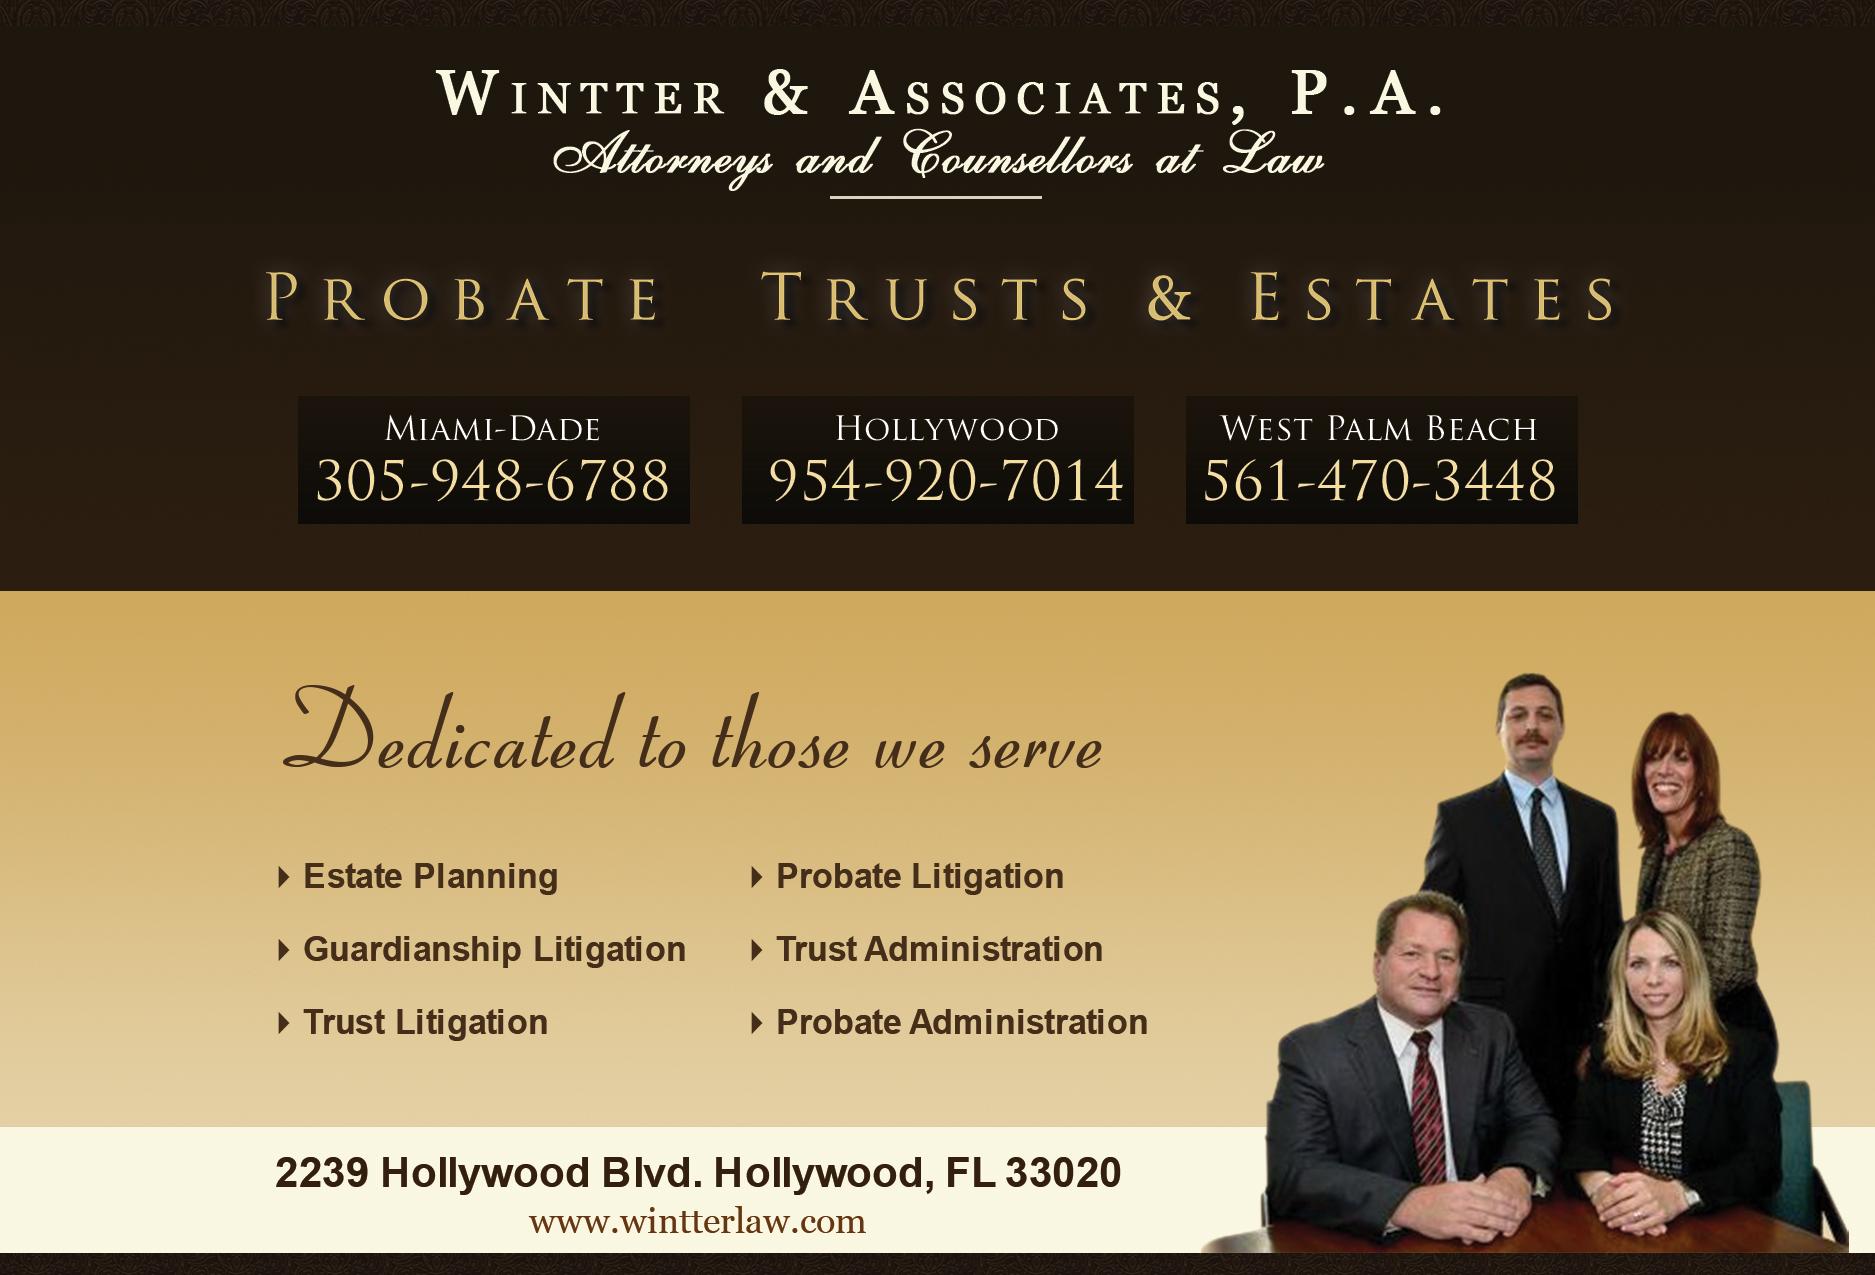 Fort Lauderdale Florida Guardianship Litigation Lawyer – Estate Planning Attorney Palm Beach Gardens